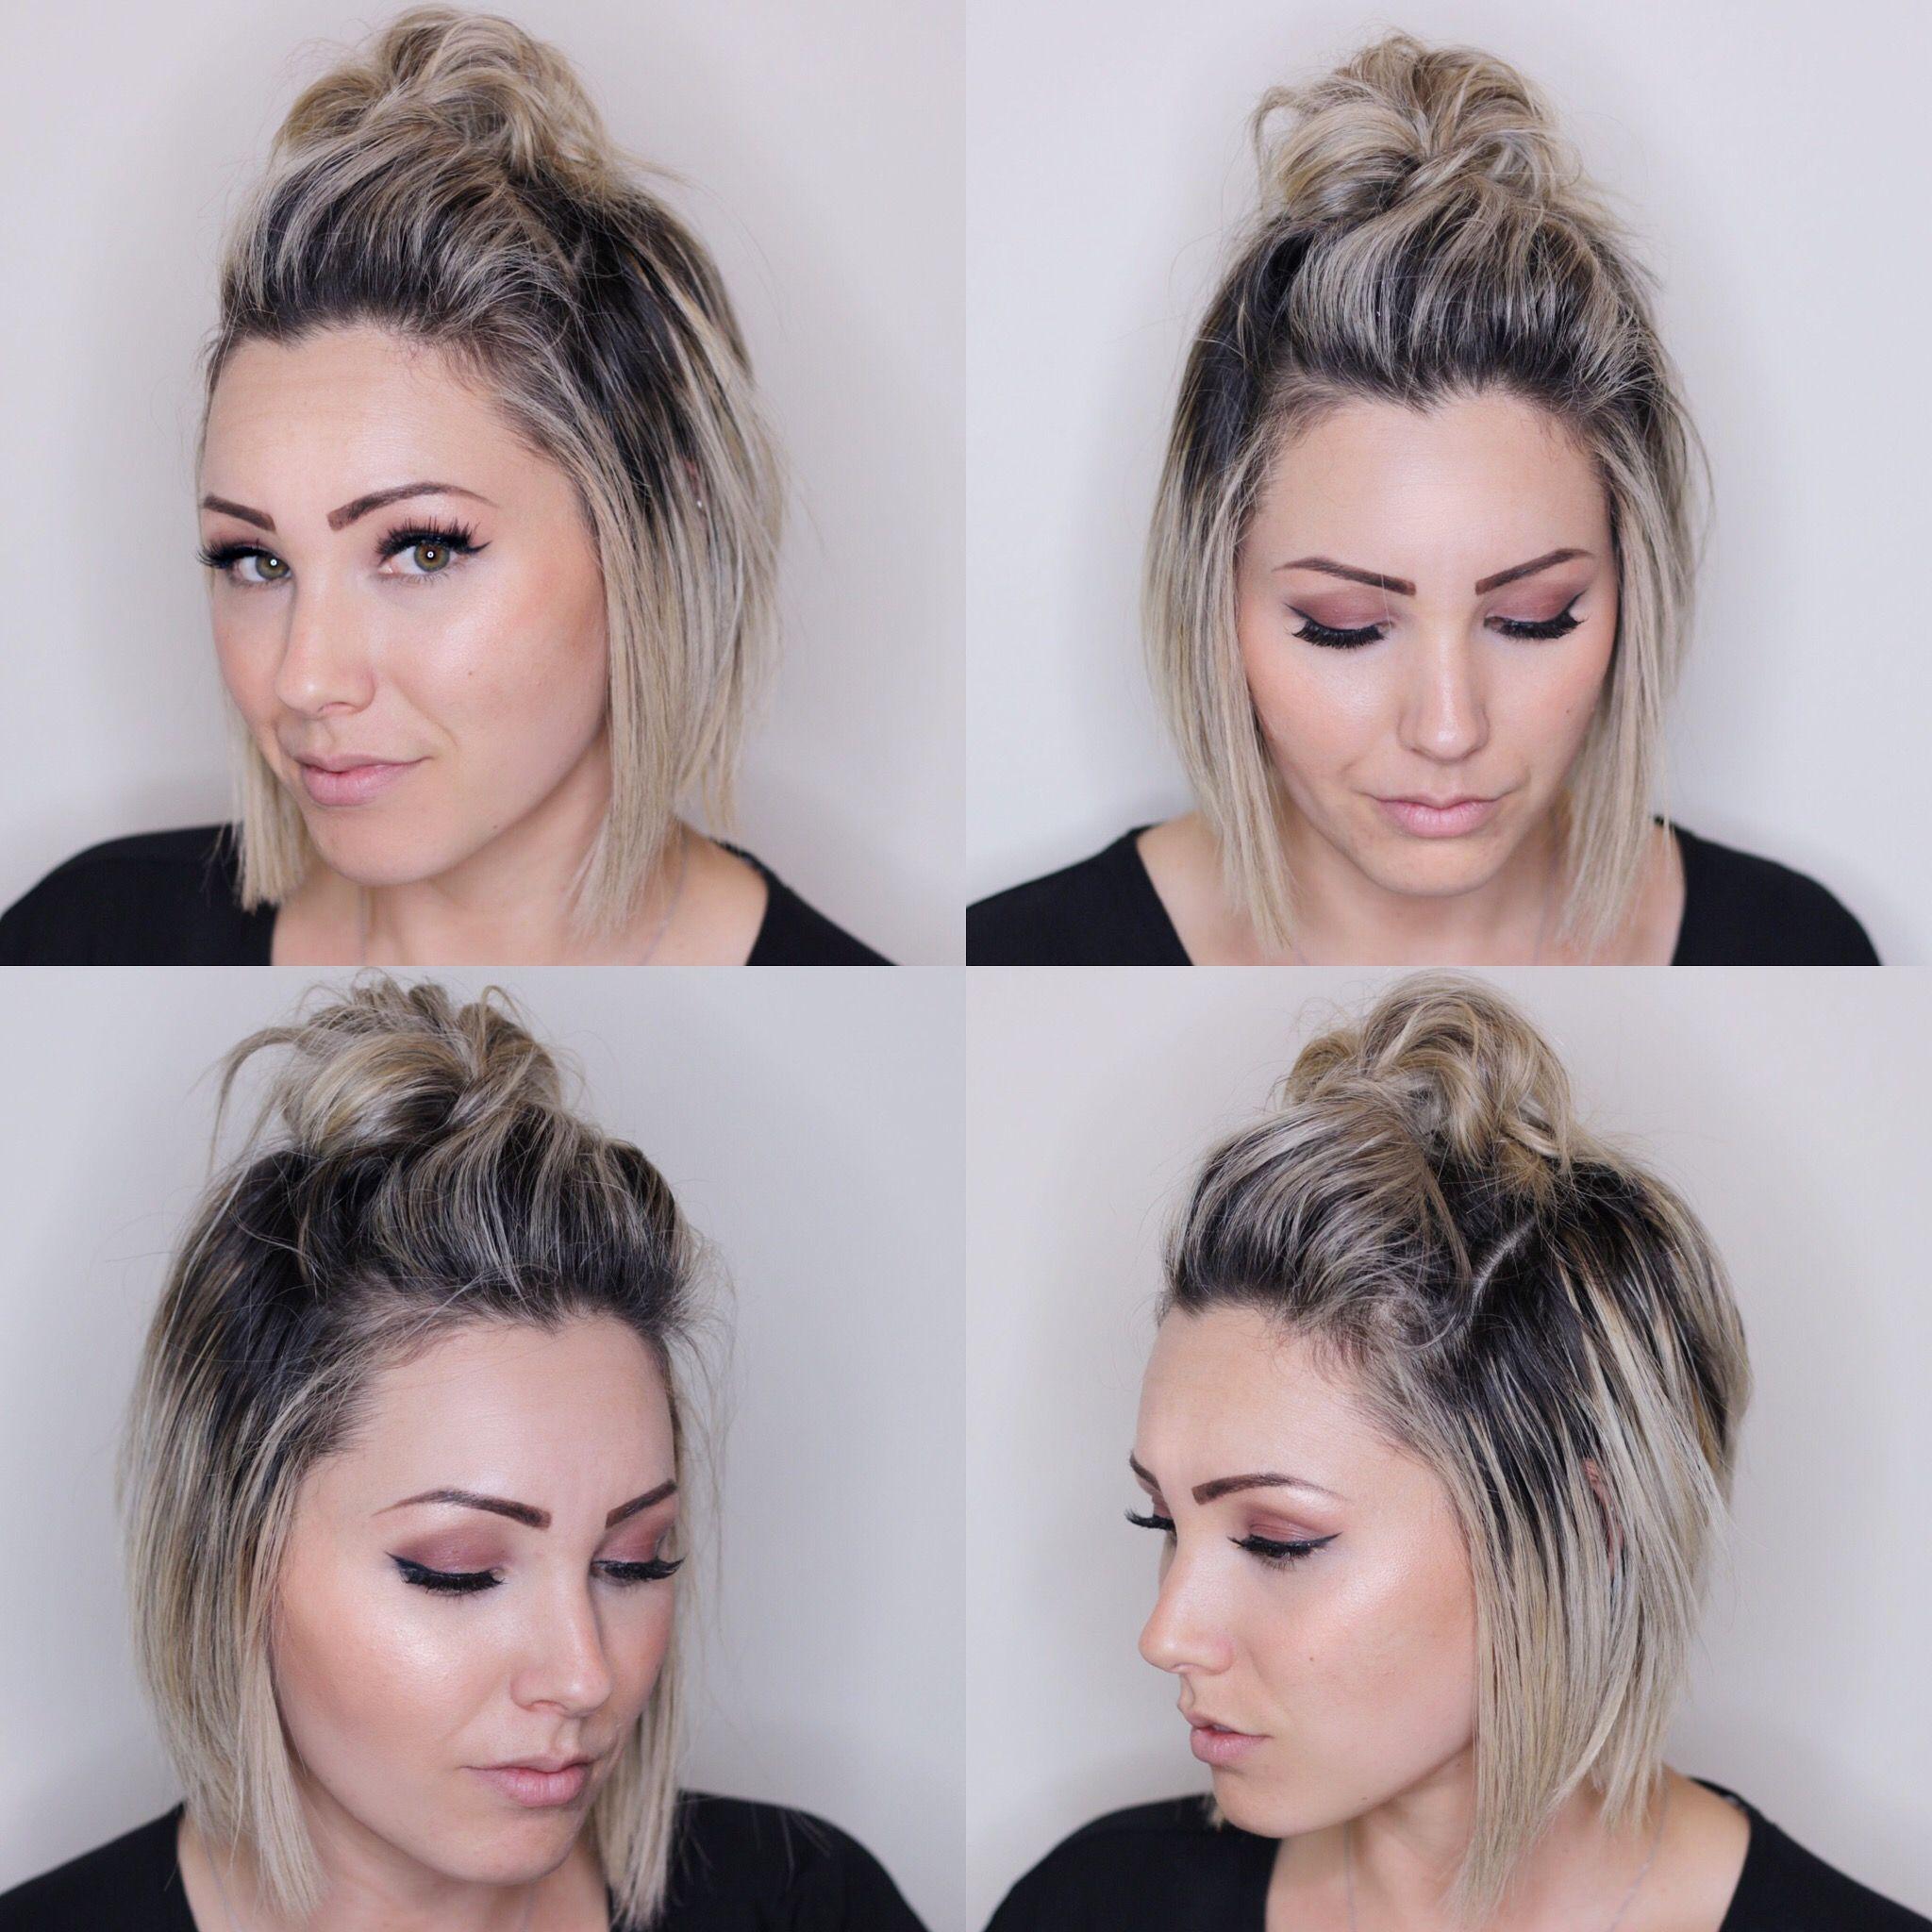 top knot short hair